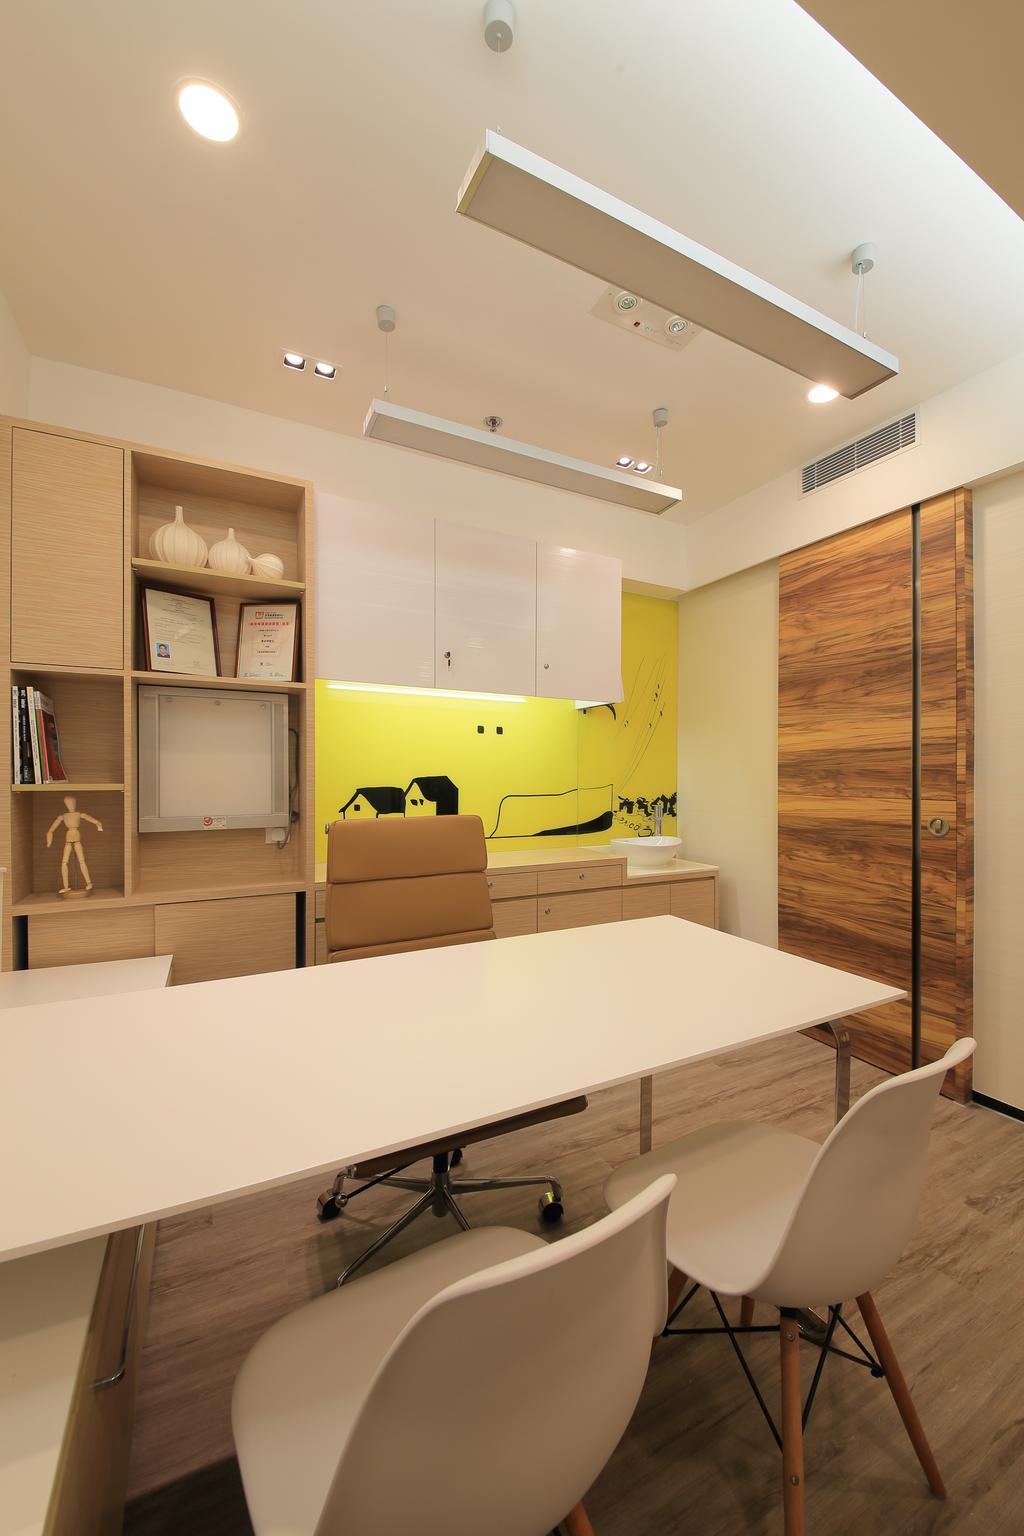 Dr. Lawrence, 商用, 室內設計師, 泛高設計事務所, 摩登, Indoors, Interior Design, Shelf